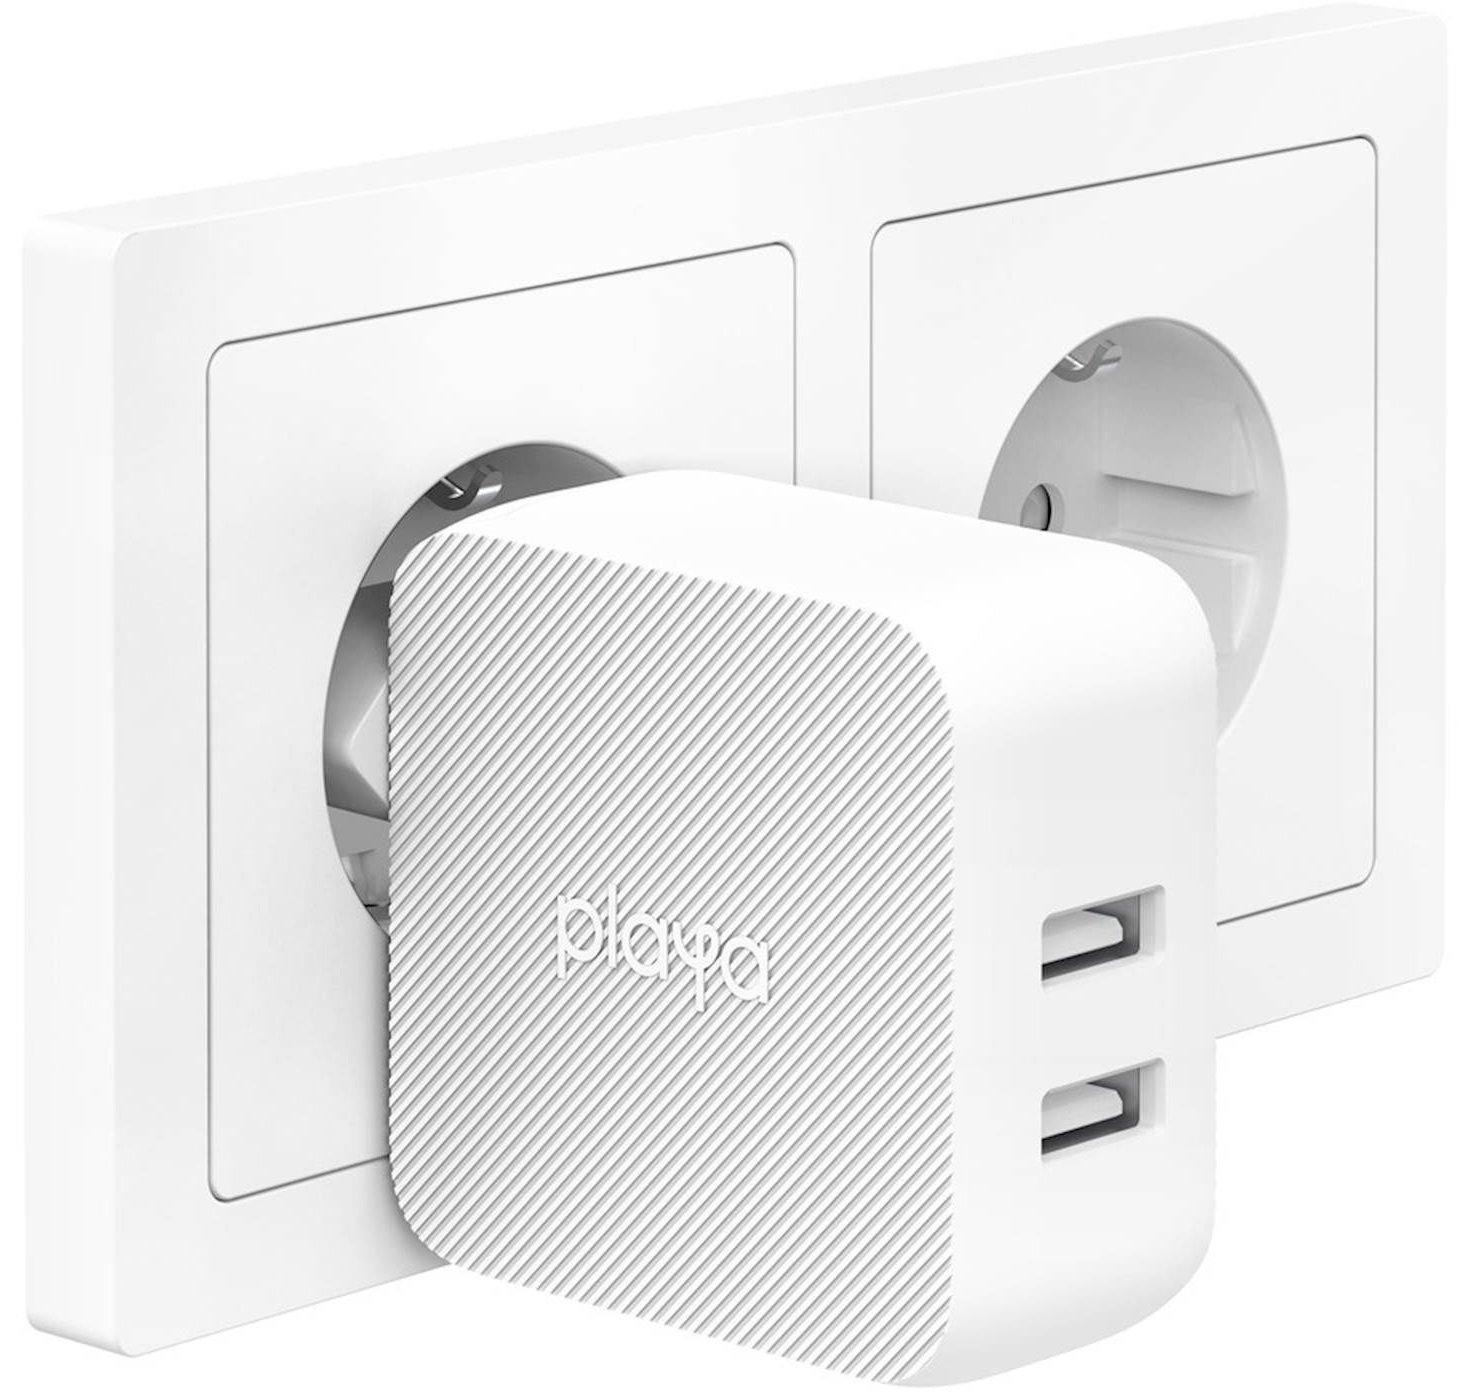 Сетевое зарядное устройство Playa by Belkin Home Charger 12W DUAL USB White (PP0007VFC2-PBB) фото 5